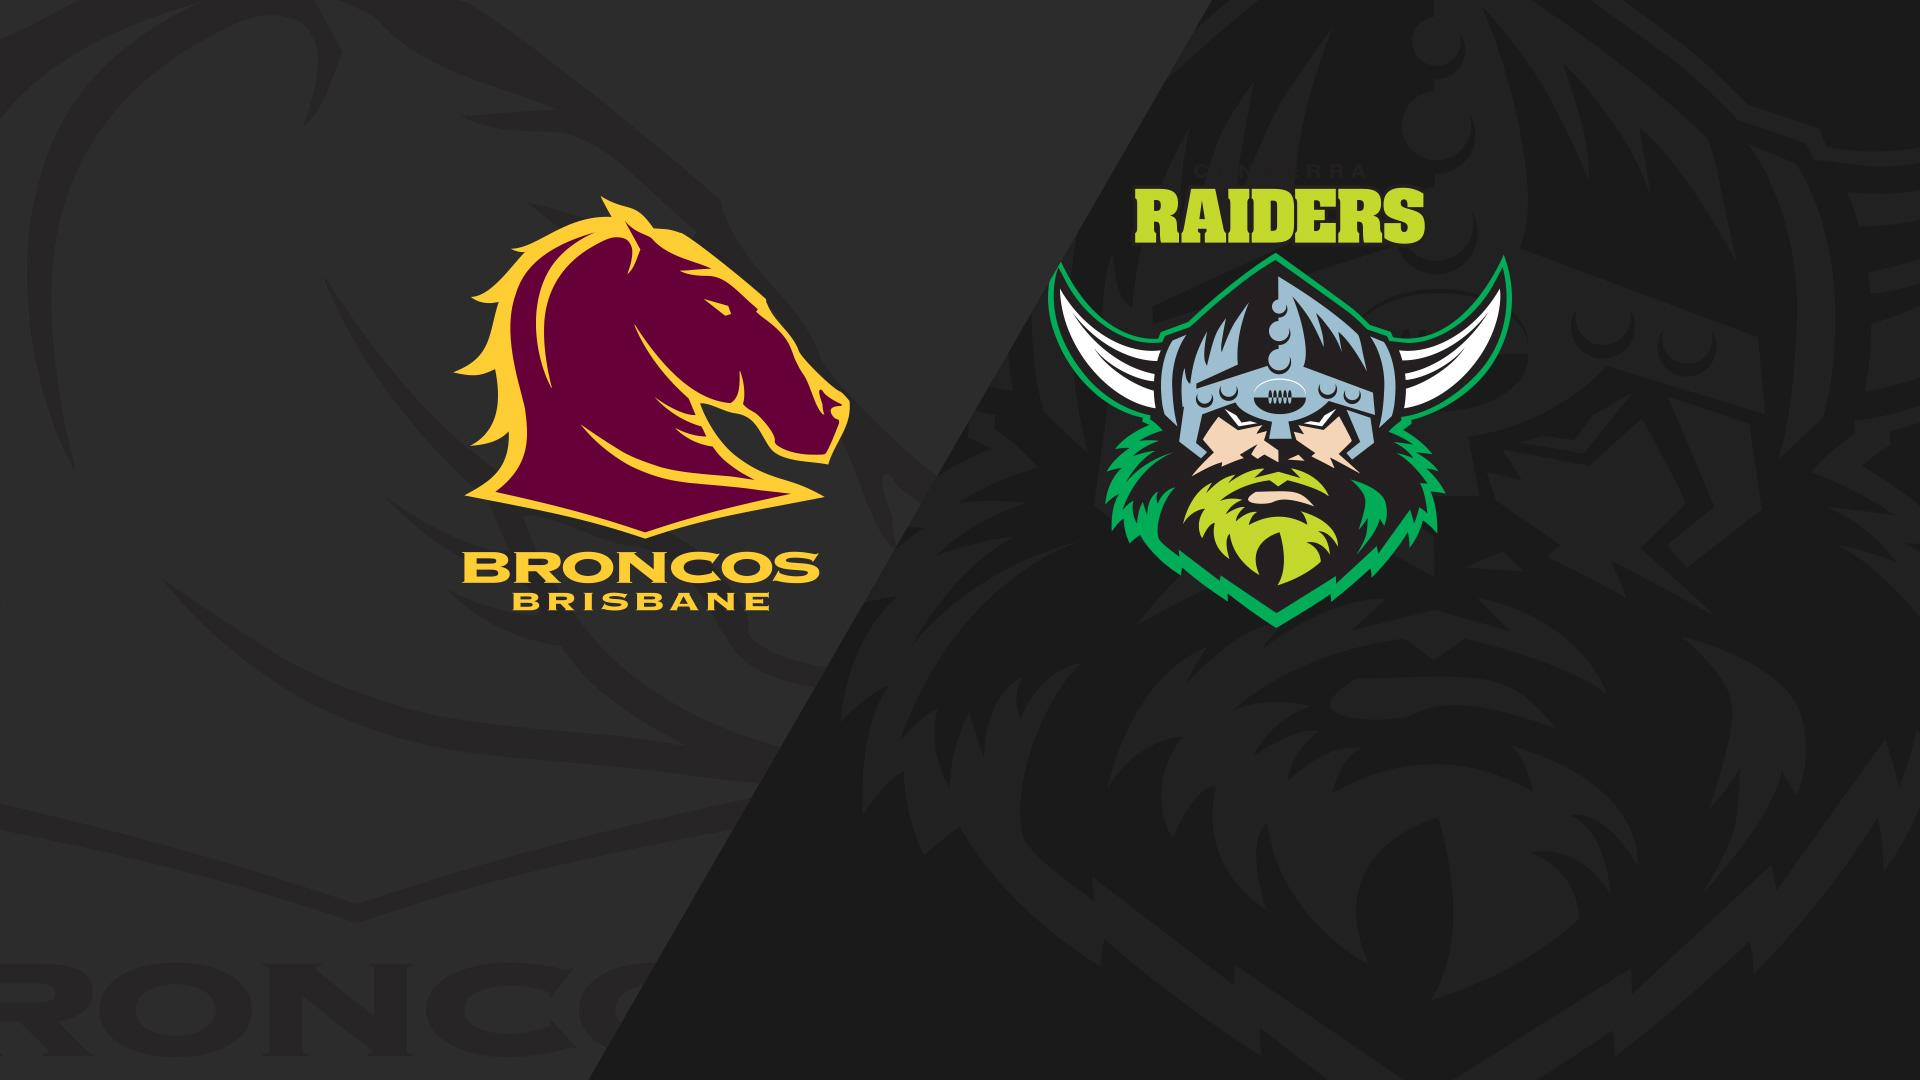 Full Match Replay: Broncos v Raiders - Round 16, 2018